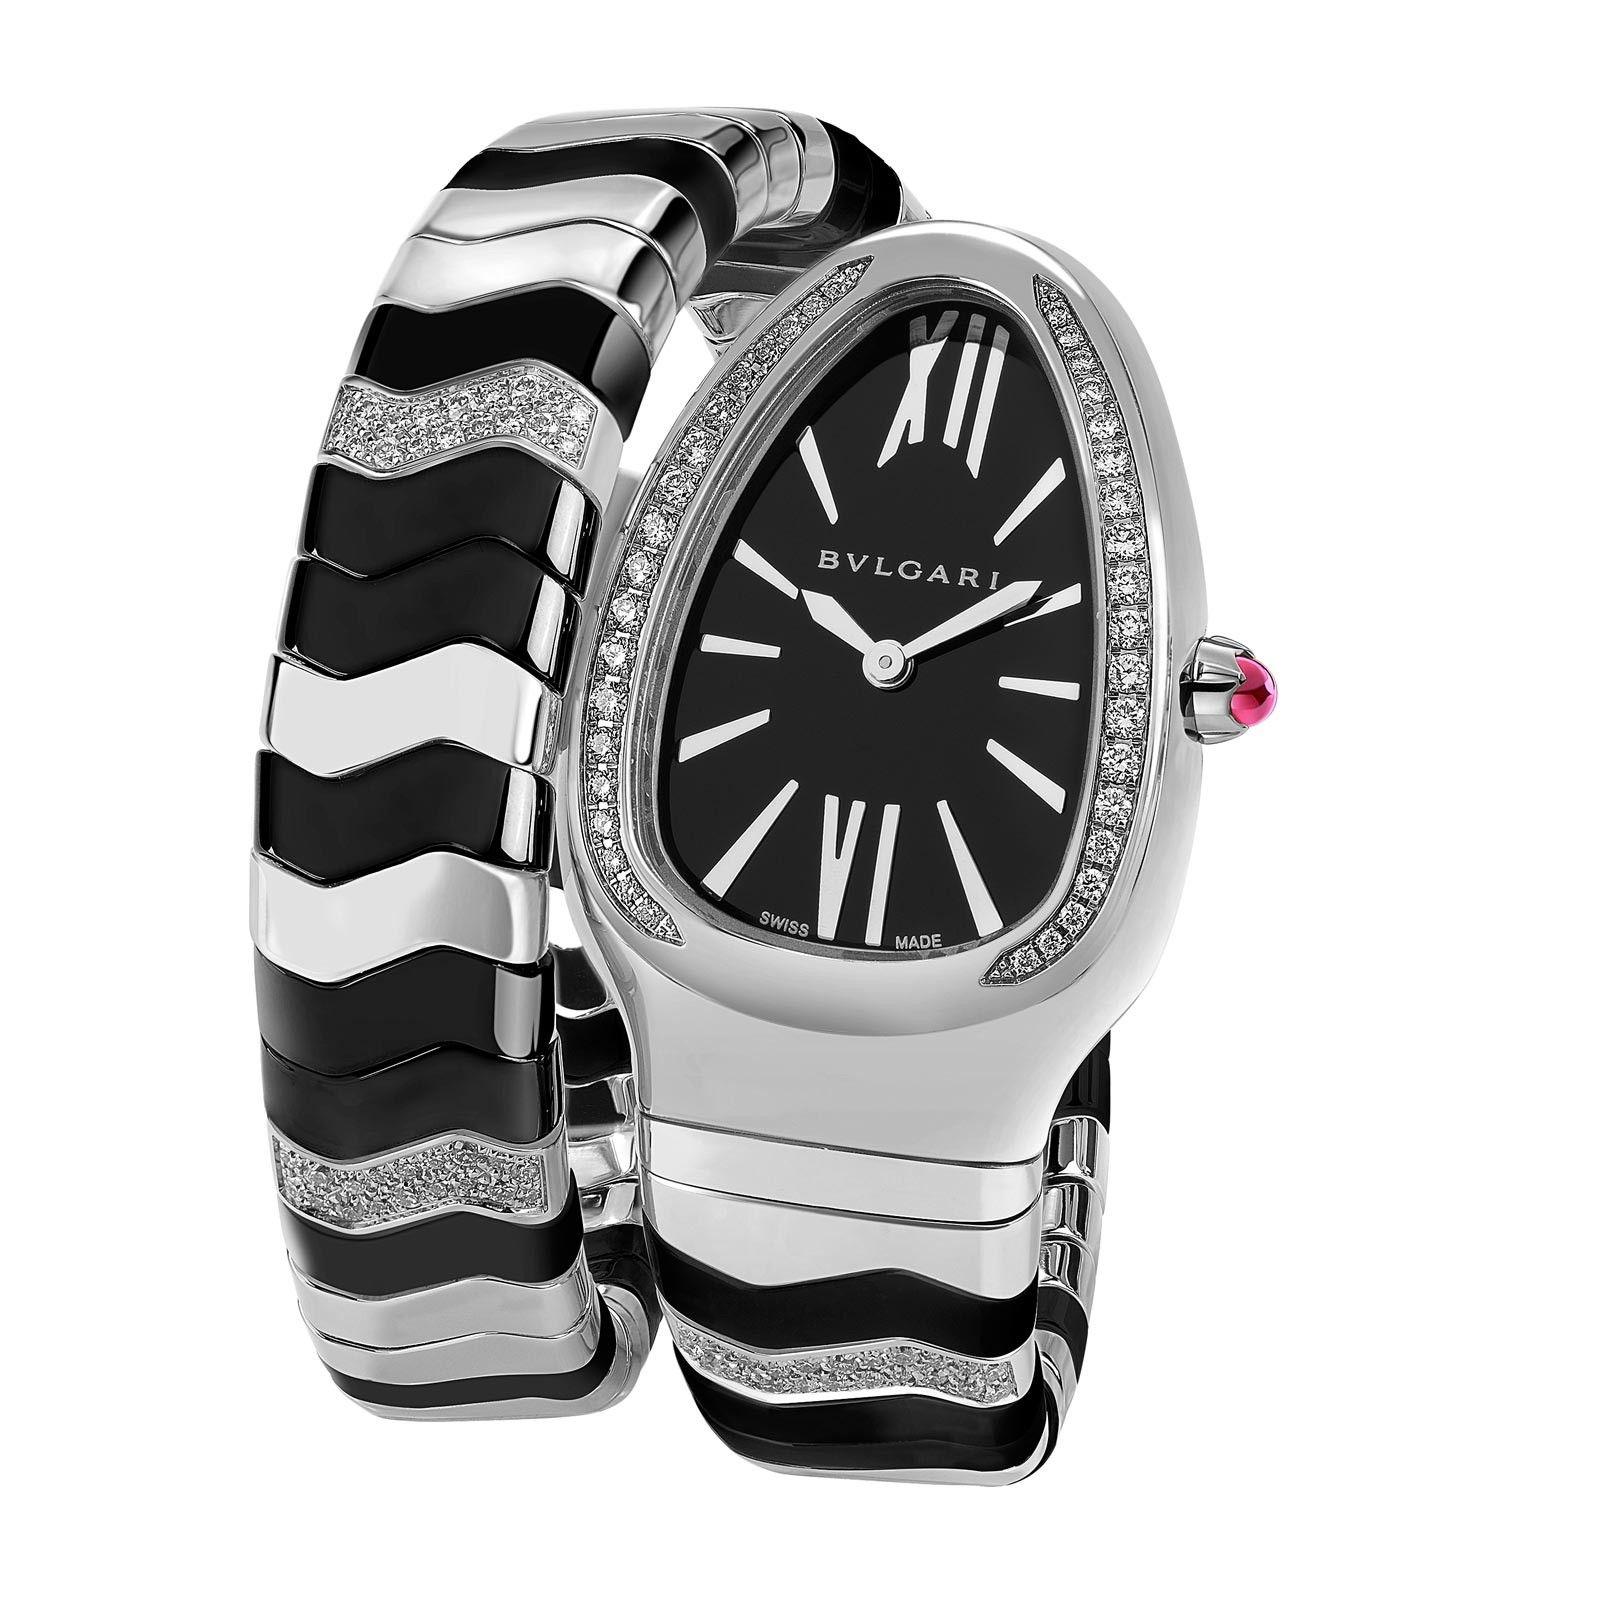 Bvlgari replica watches - Bulgari Serpenti Spiga Acier C Ramique Noire Watch